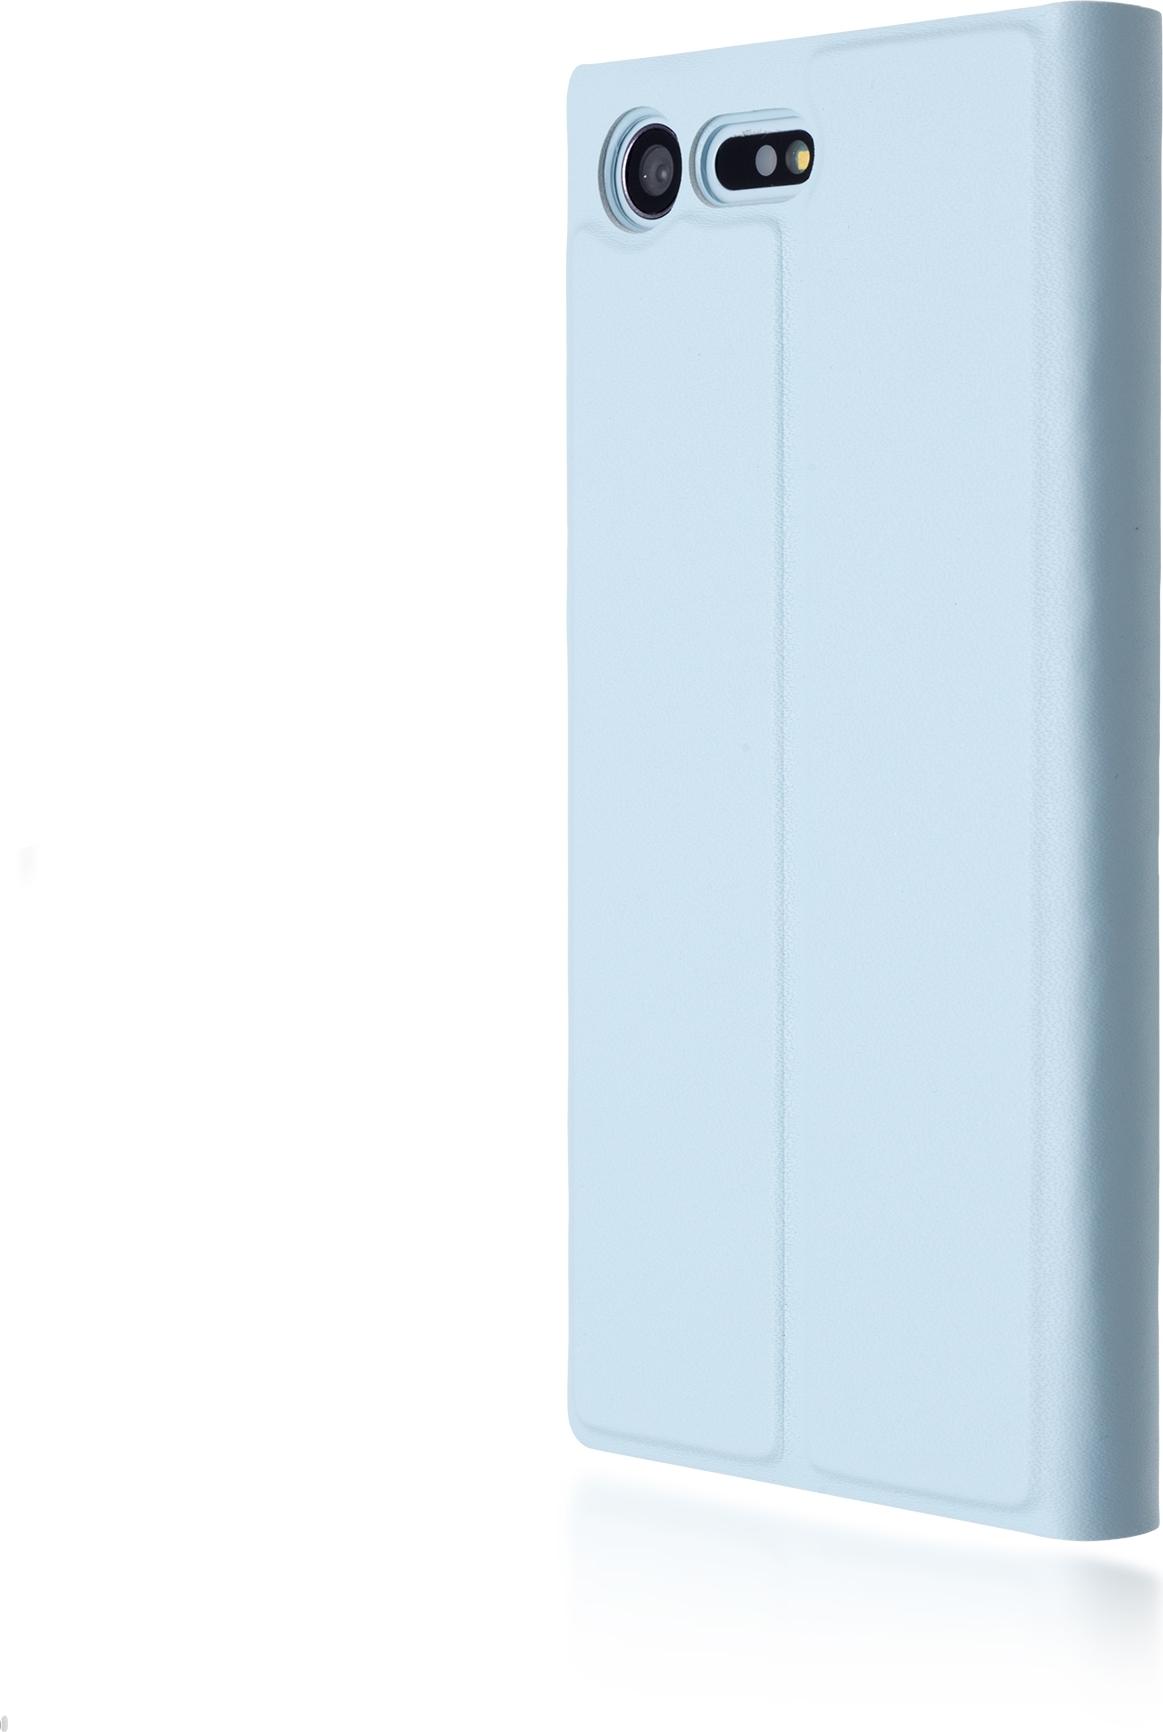 Чехол Brosco Book для Sony Xperia X Compact, голубой цена и фото